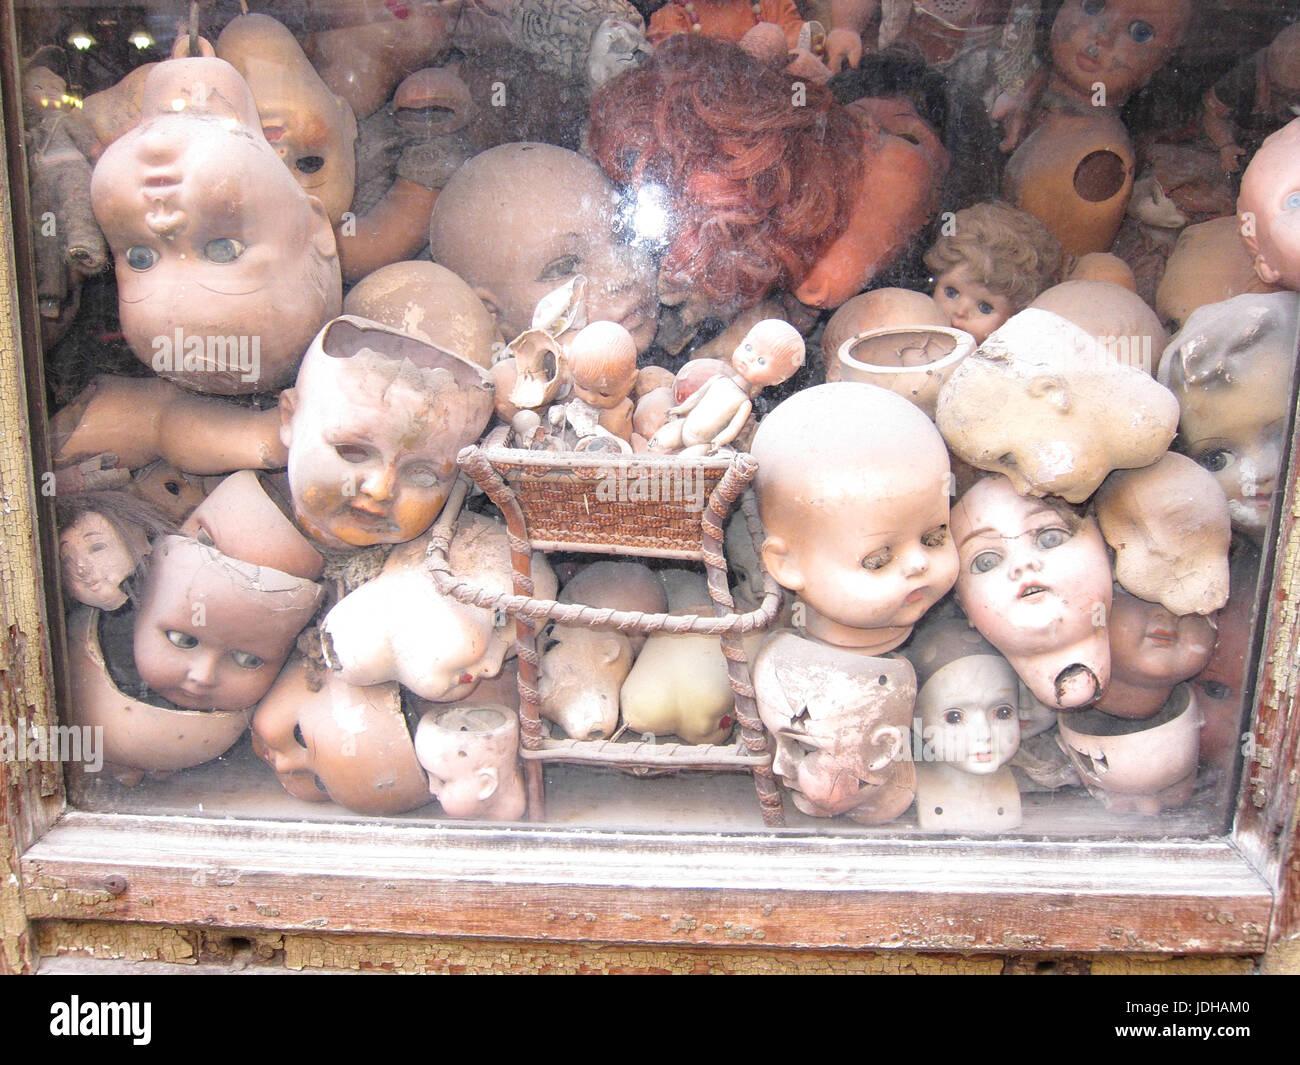 Dolls shop - Stock Image